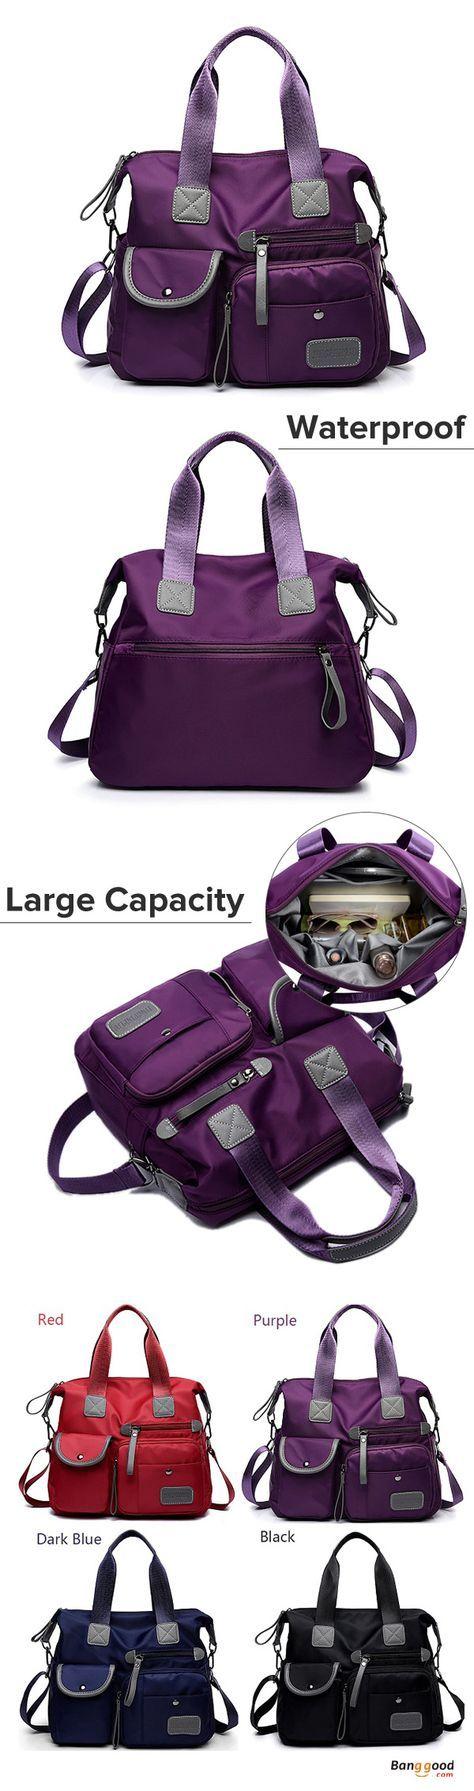 US$31.91+Free shipping. Women Bags, Waterproof Crossbody Bags, Casual Bags, Chest Bags, Multifunction Handbag, Backpack, Shoulder Bags. Waterproof, Large Capacity. Color: Black, Purple, Dark Blue, Red. Shop now~